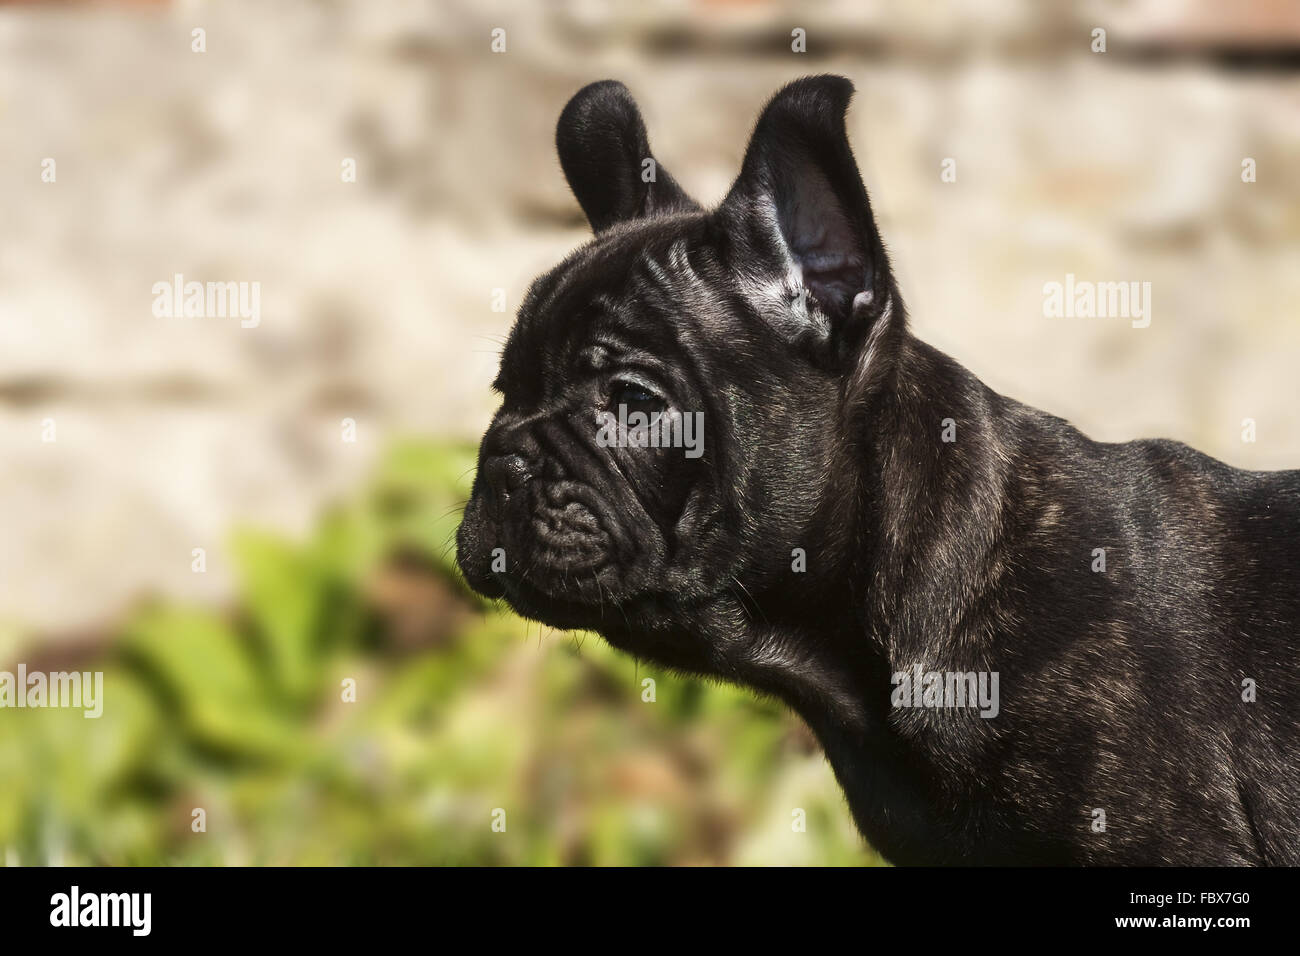 französische Bulldogge Welpen Porträt profil Stockbild